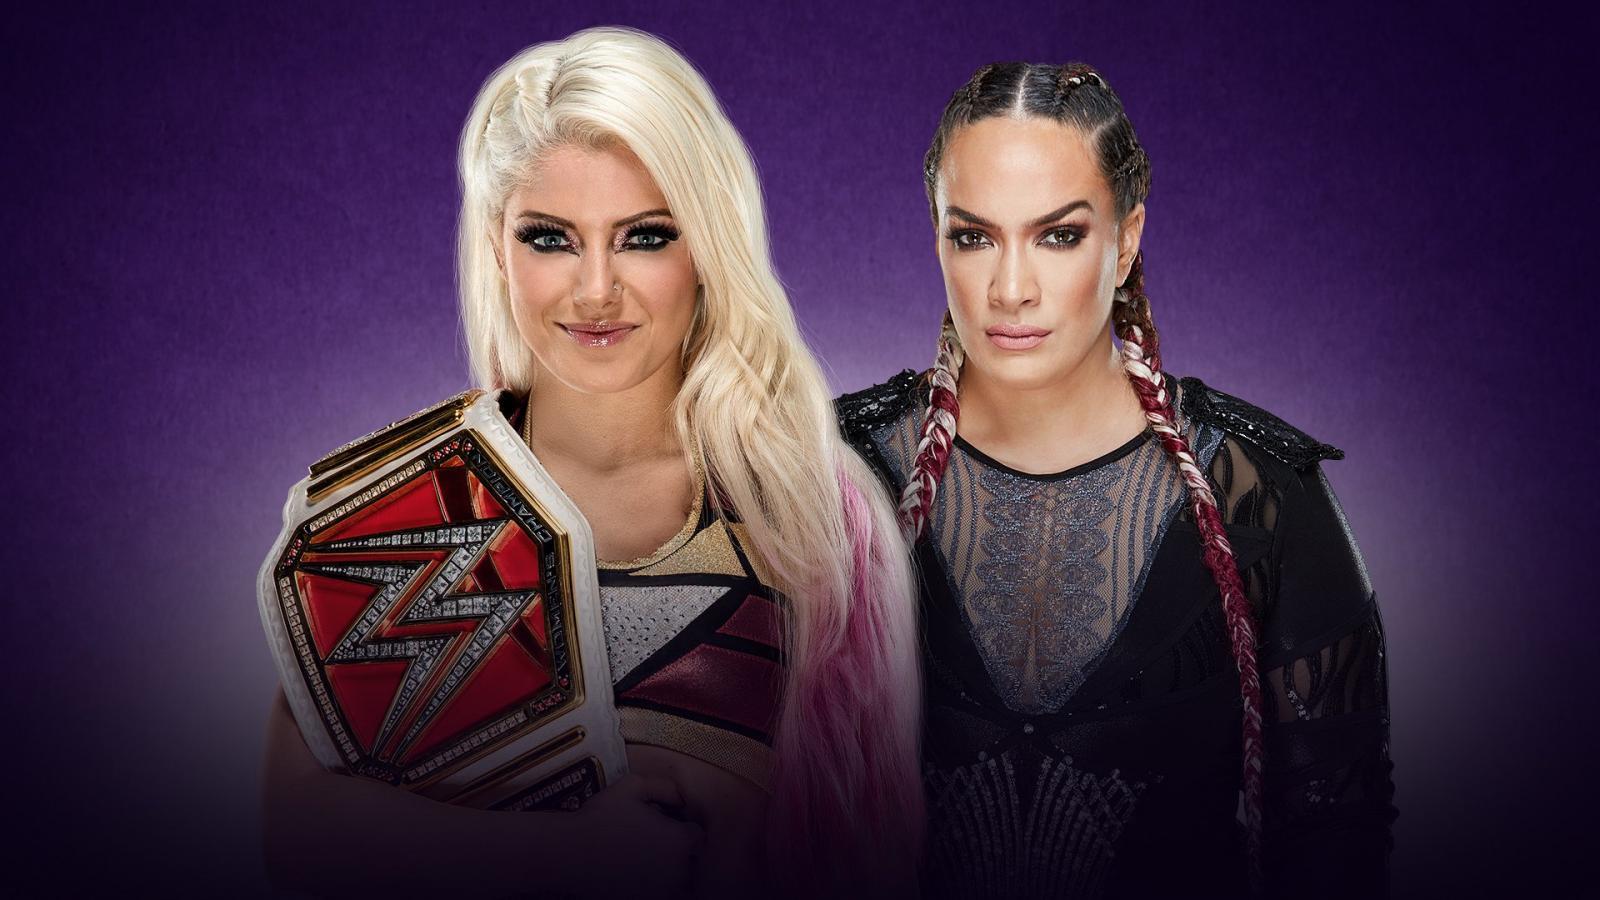 WWE: Alexa Bliss reveals the importance of her match against Nia Jax - Alexa Bliss